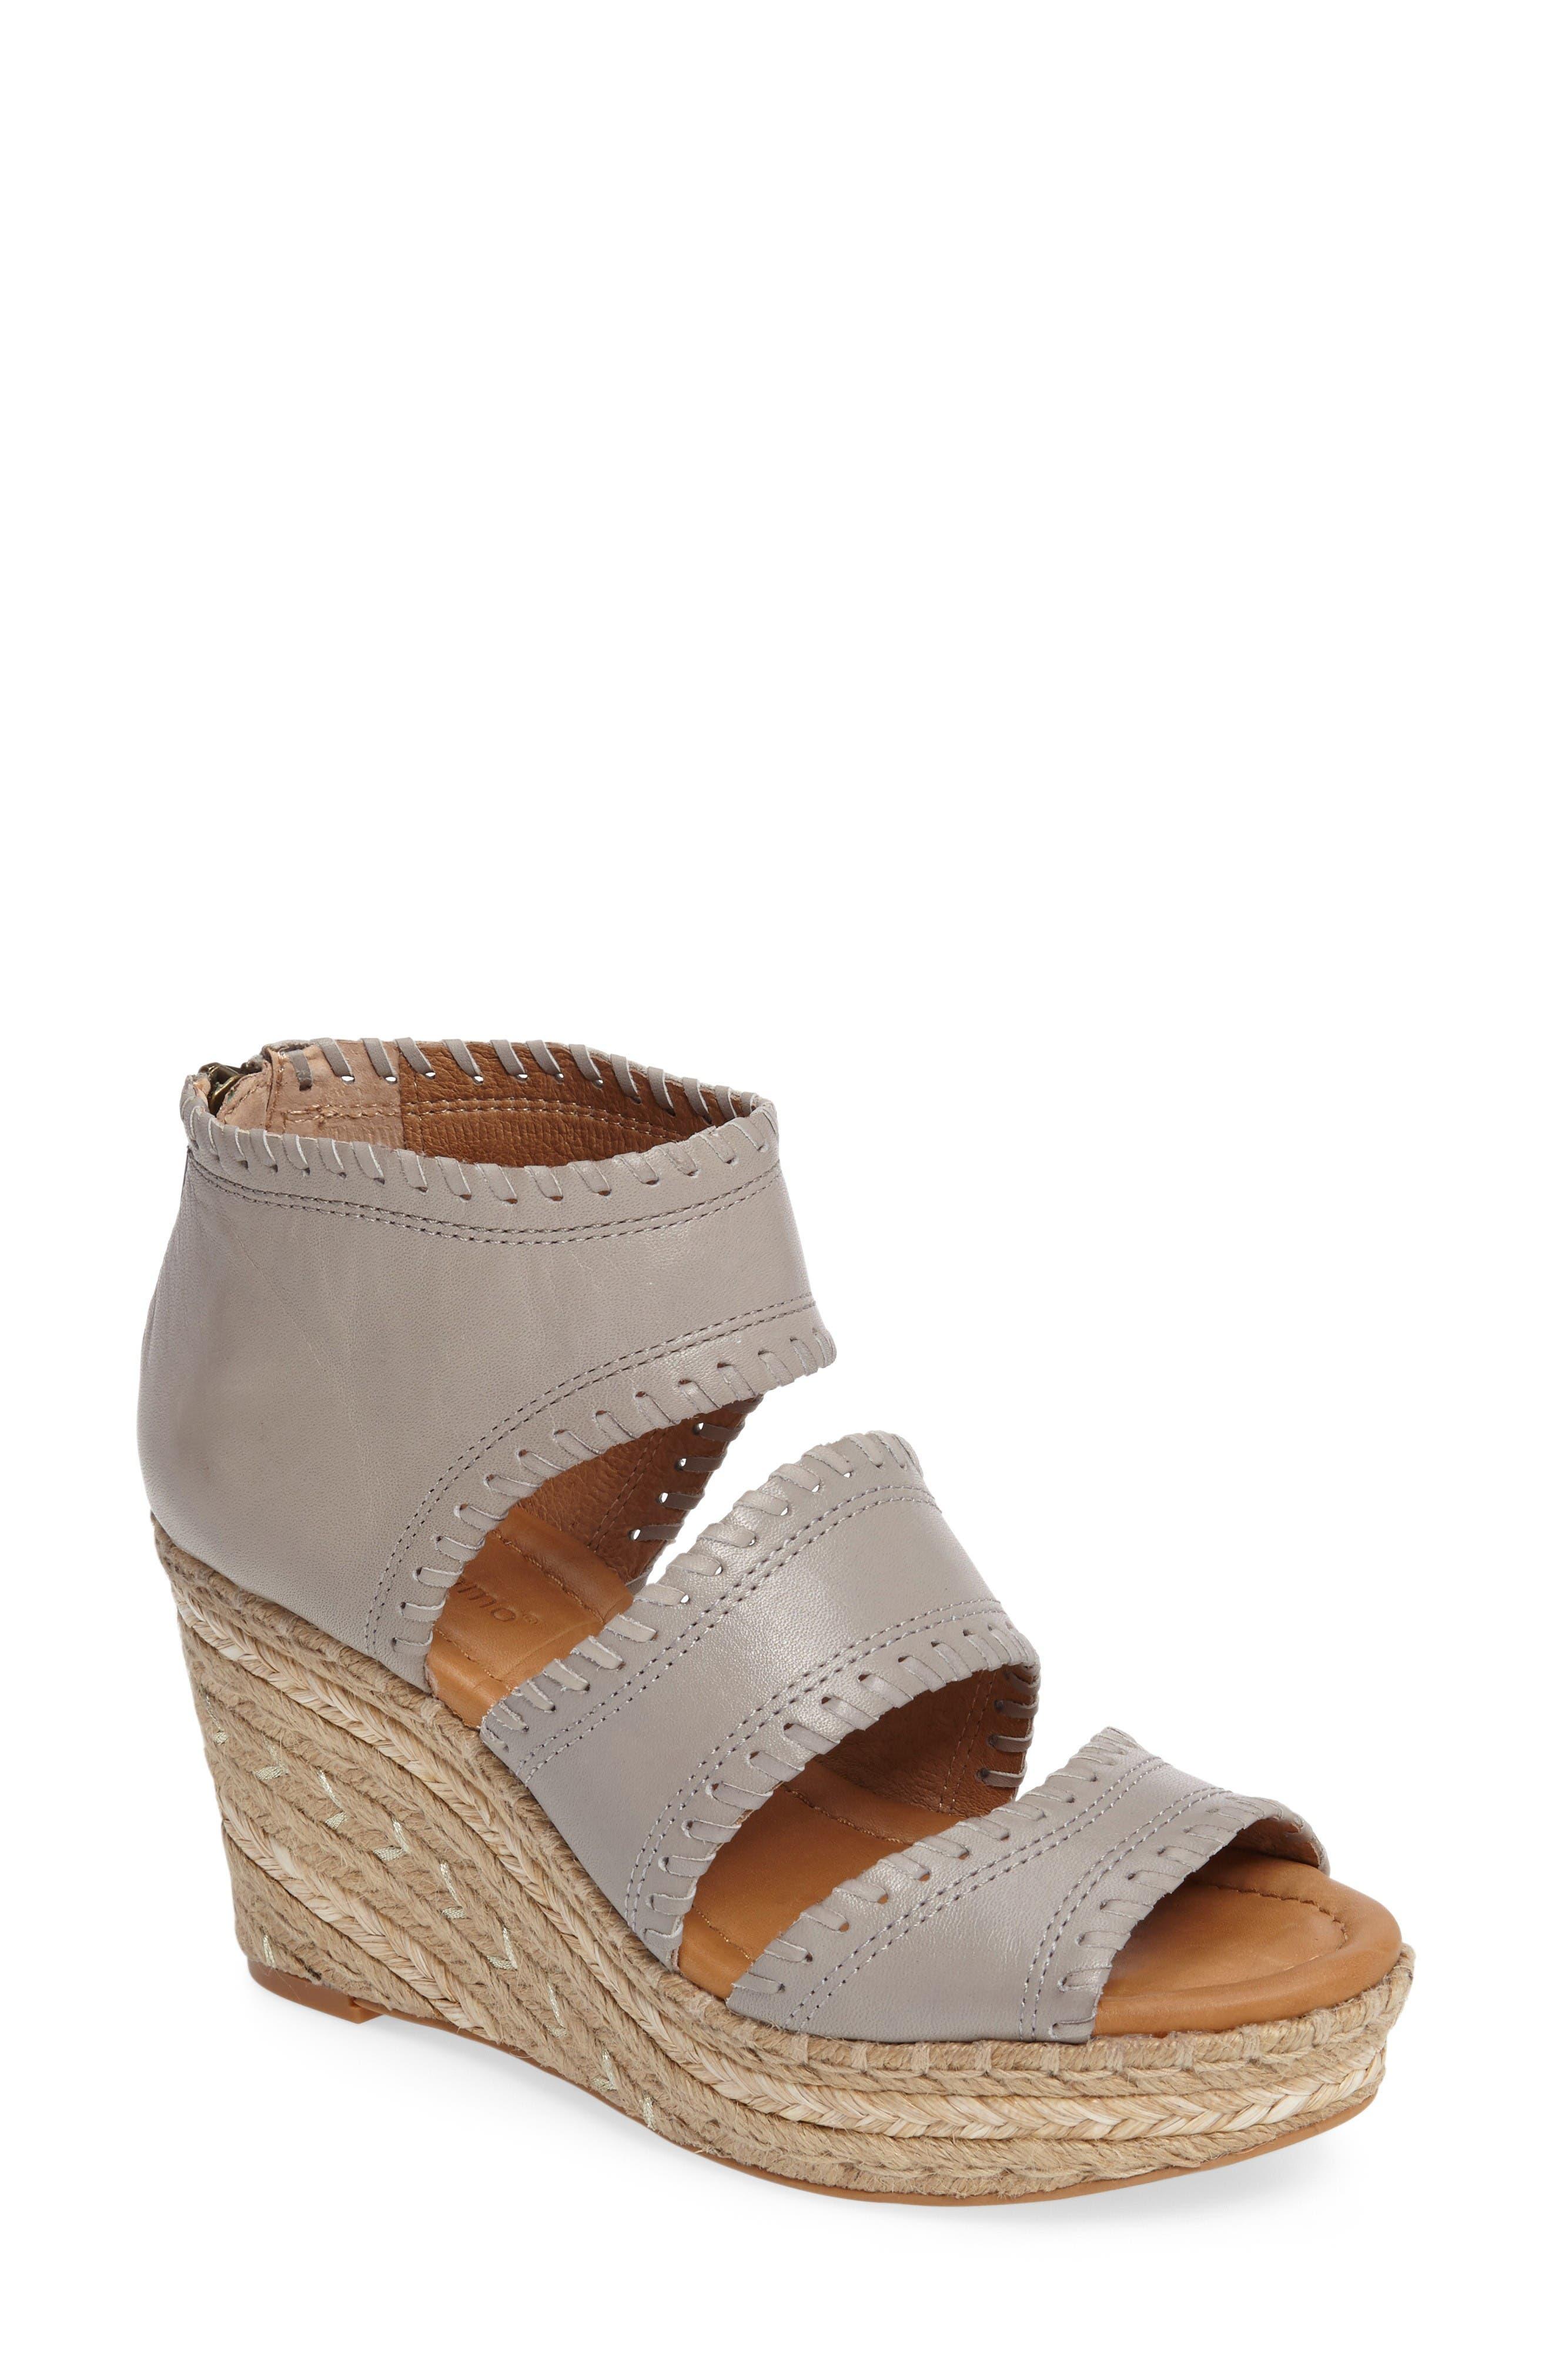 Alternate Image 1 Selected - Corso Como Joyce Wedge Sandal (Women)